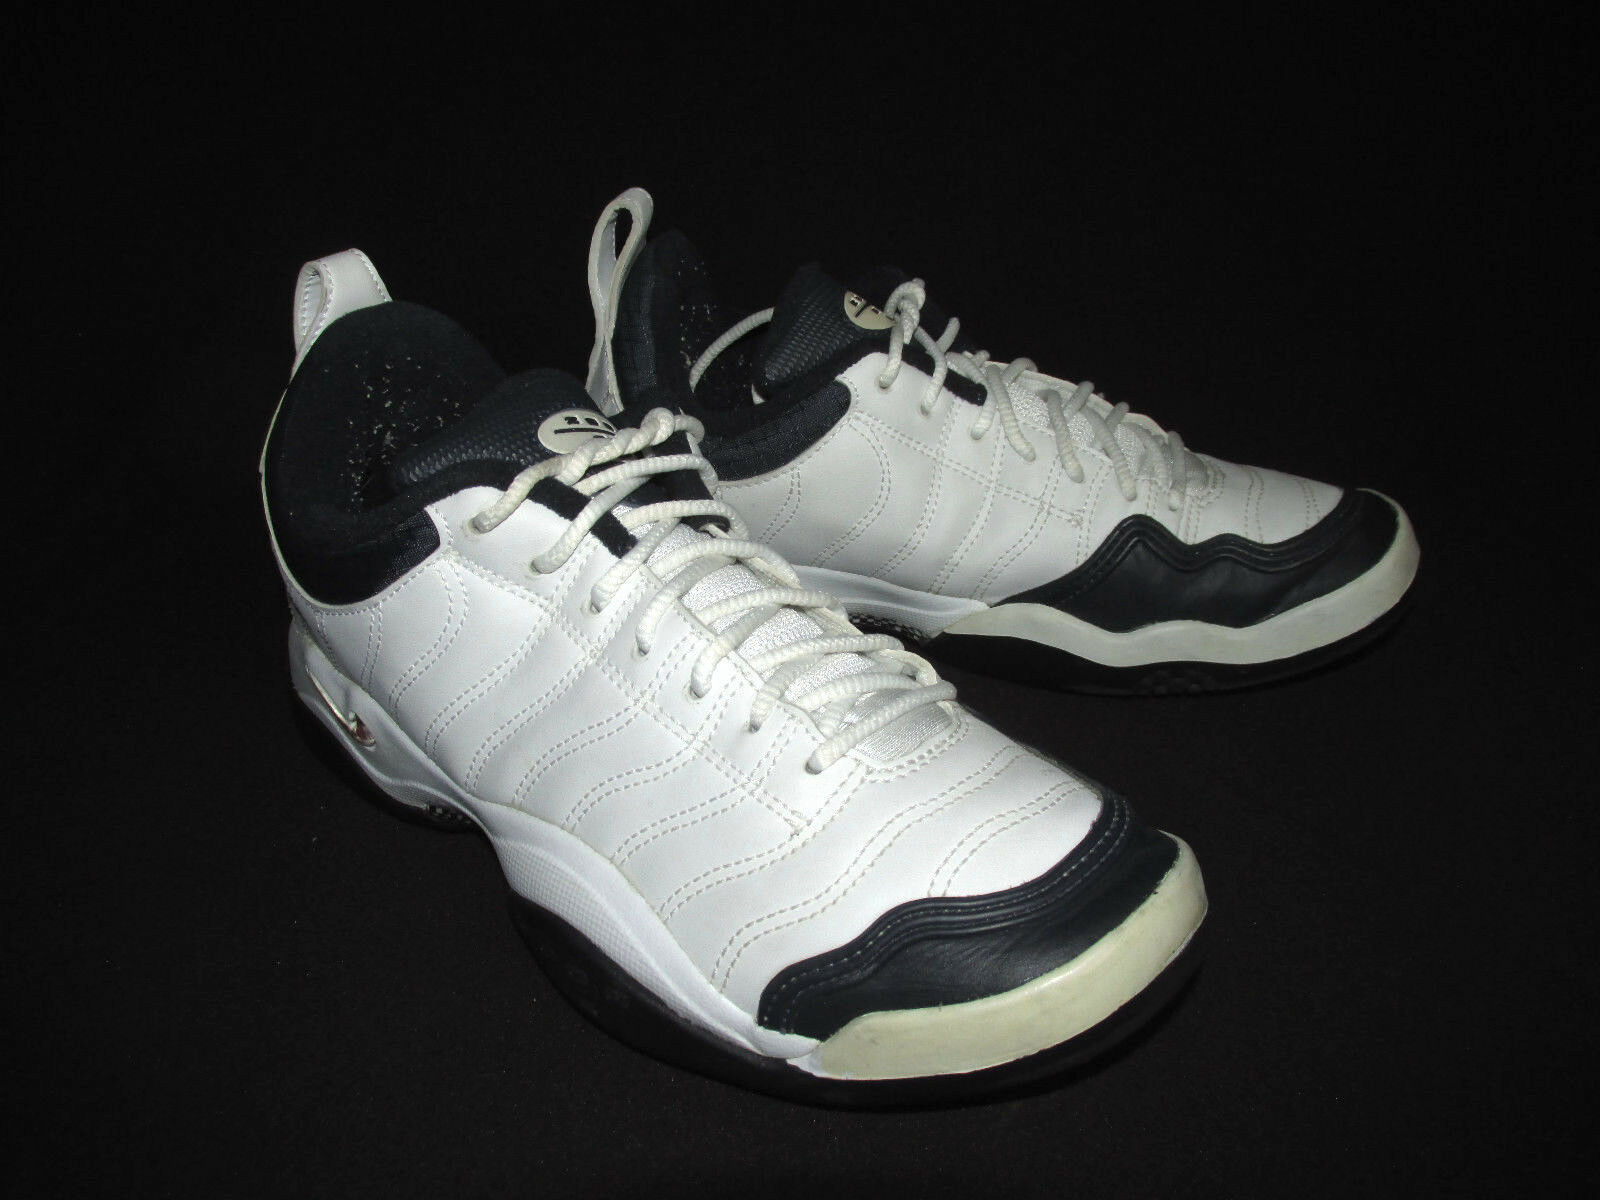 Nike air zoom oszillieren mens tennisschuhe 140370-144 weiße schwarze us - 7.5m